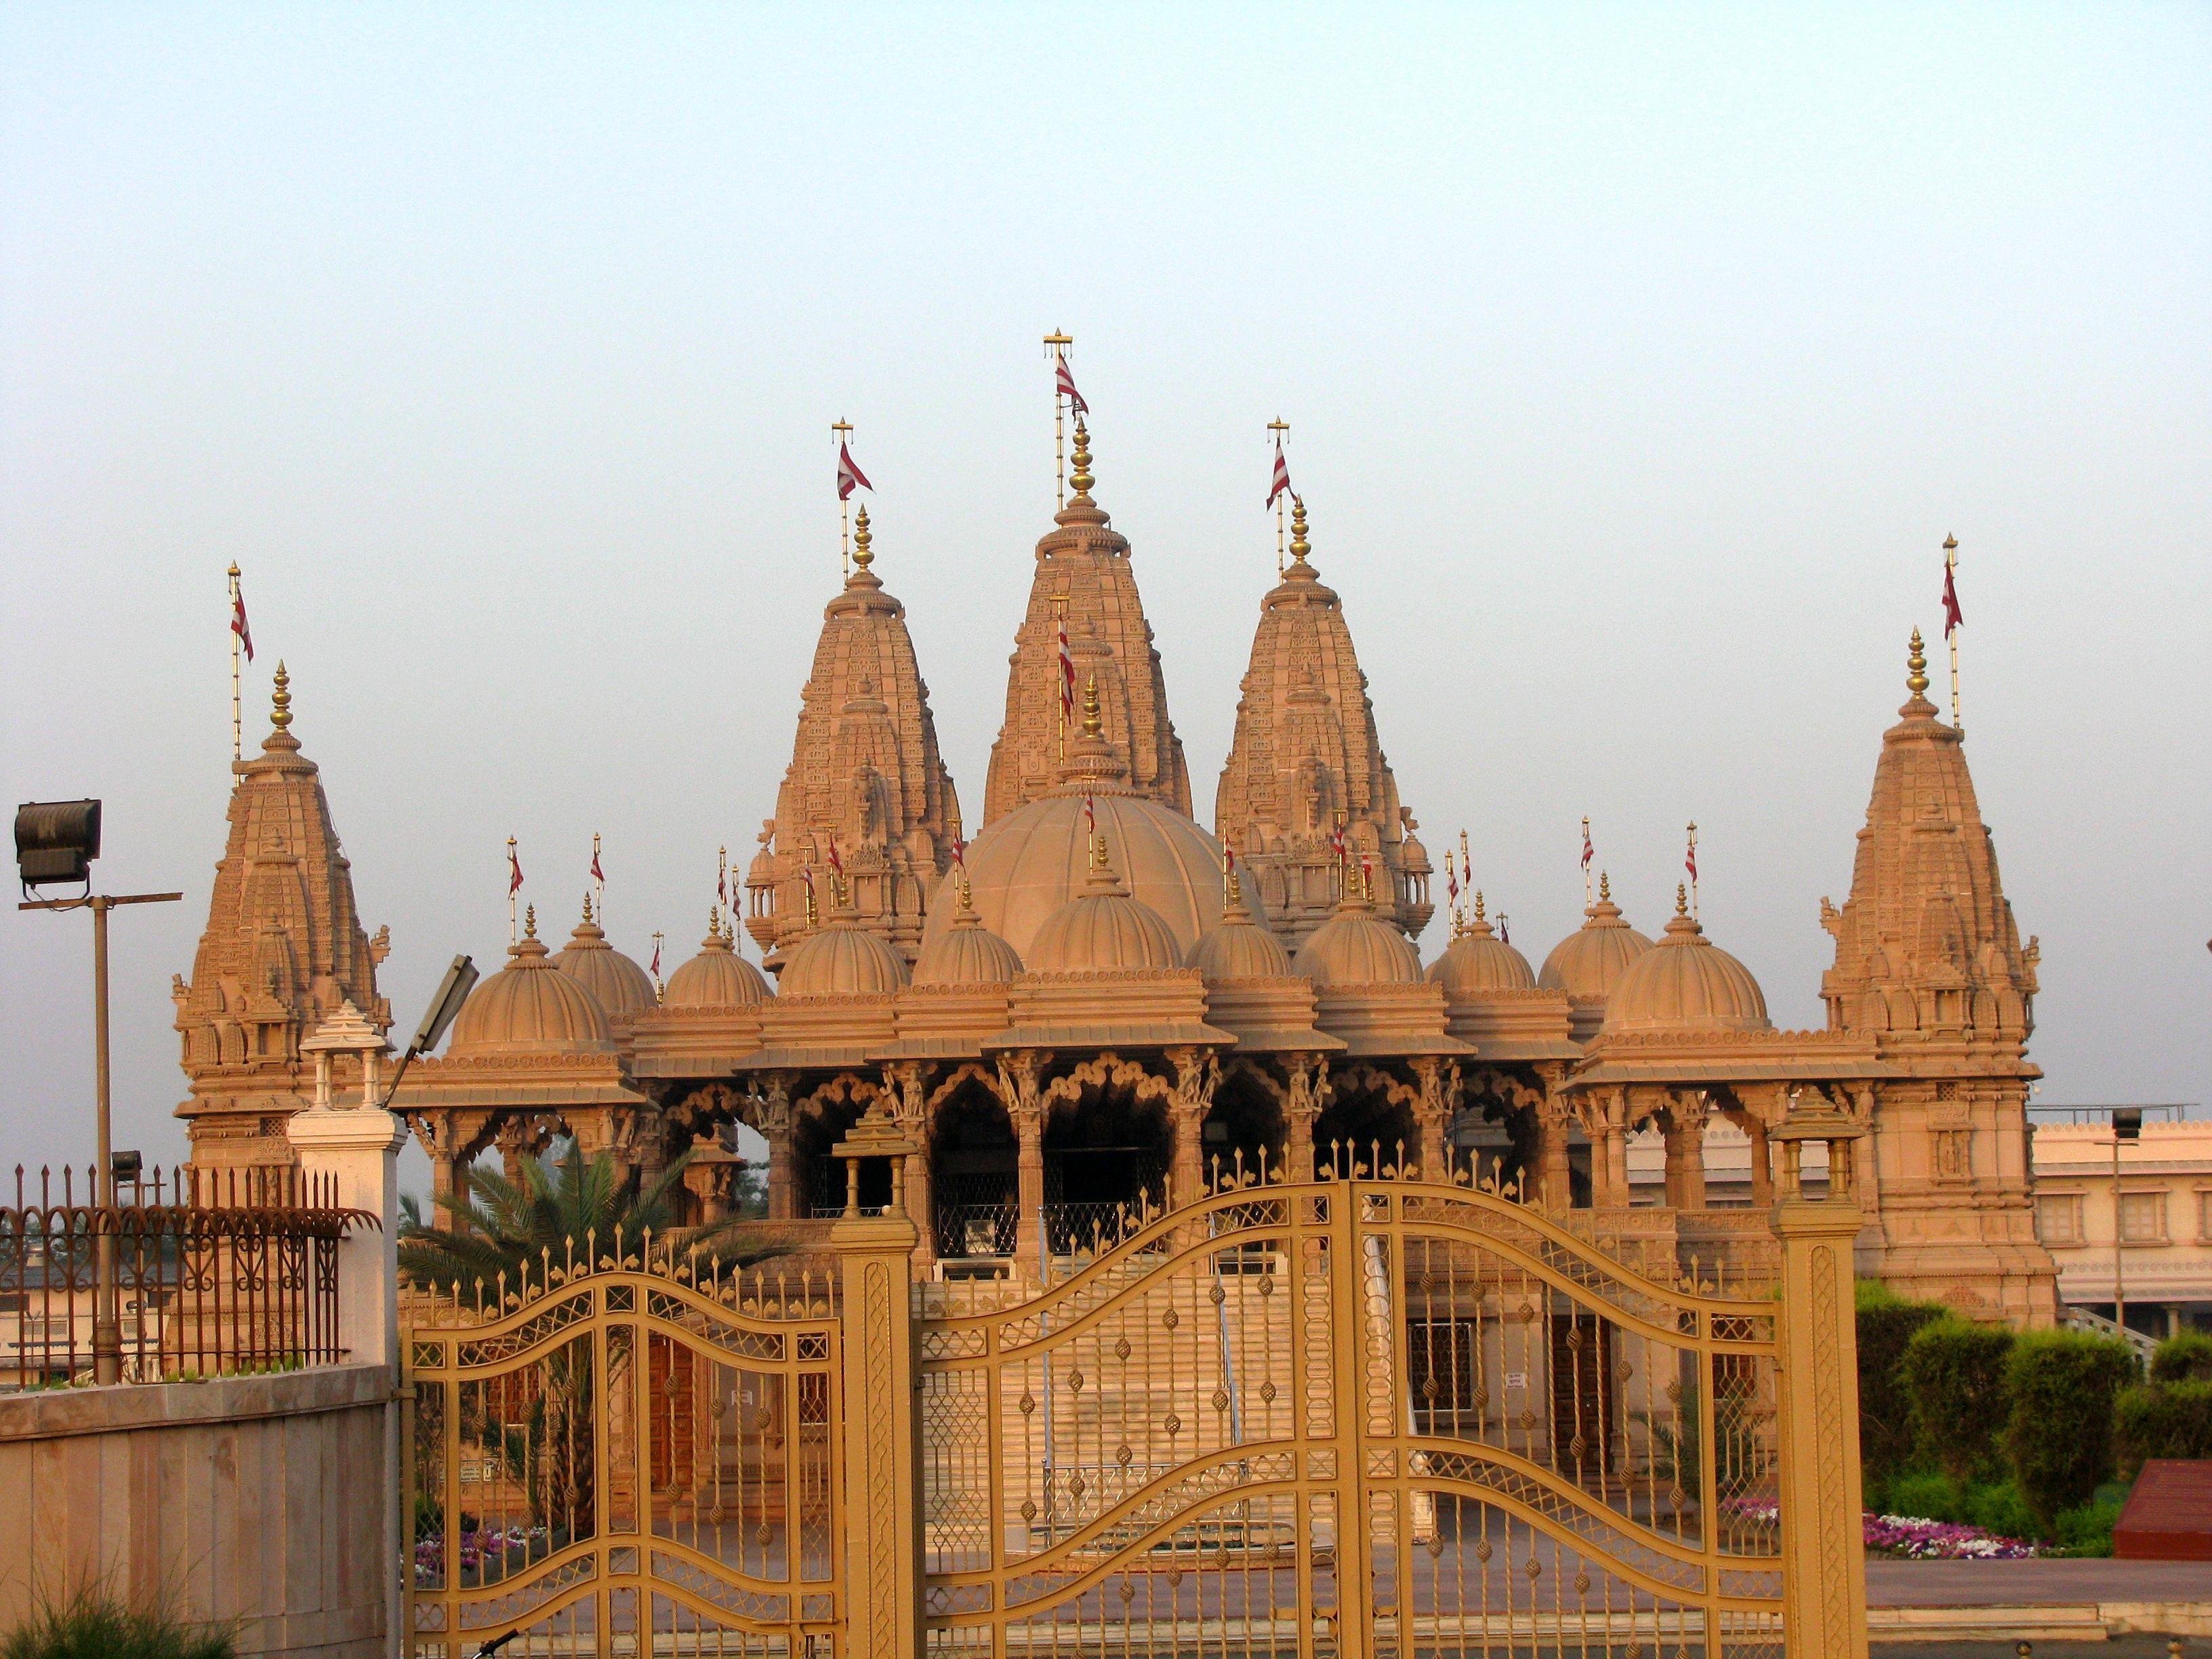 Shri Swami Narayan Mandir